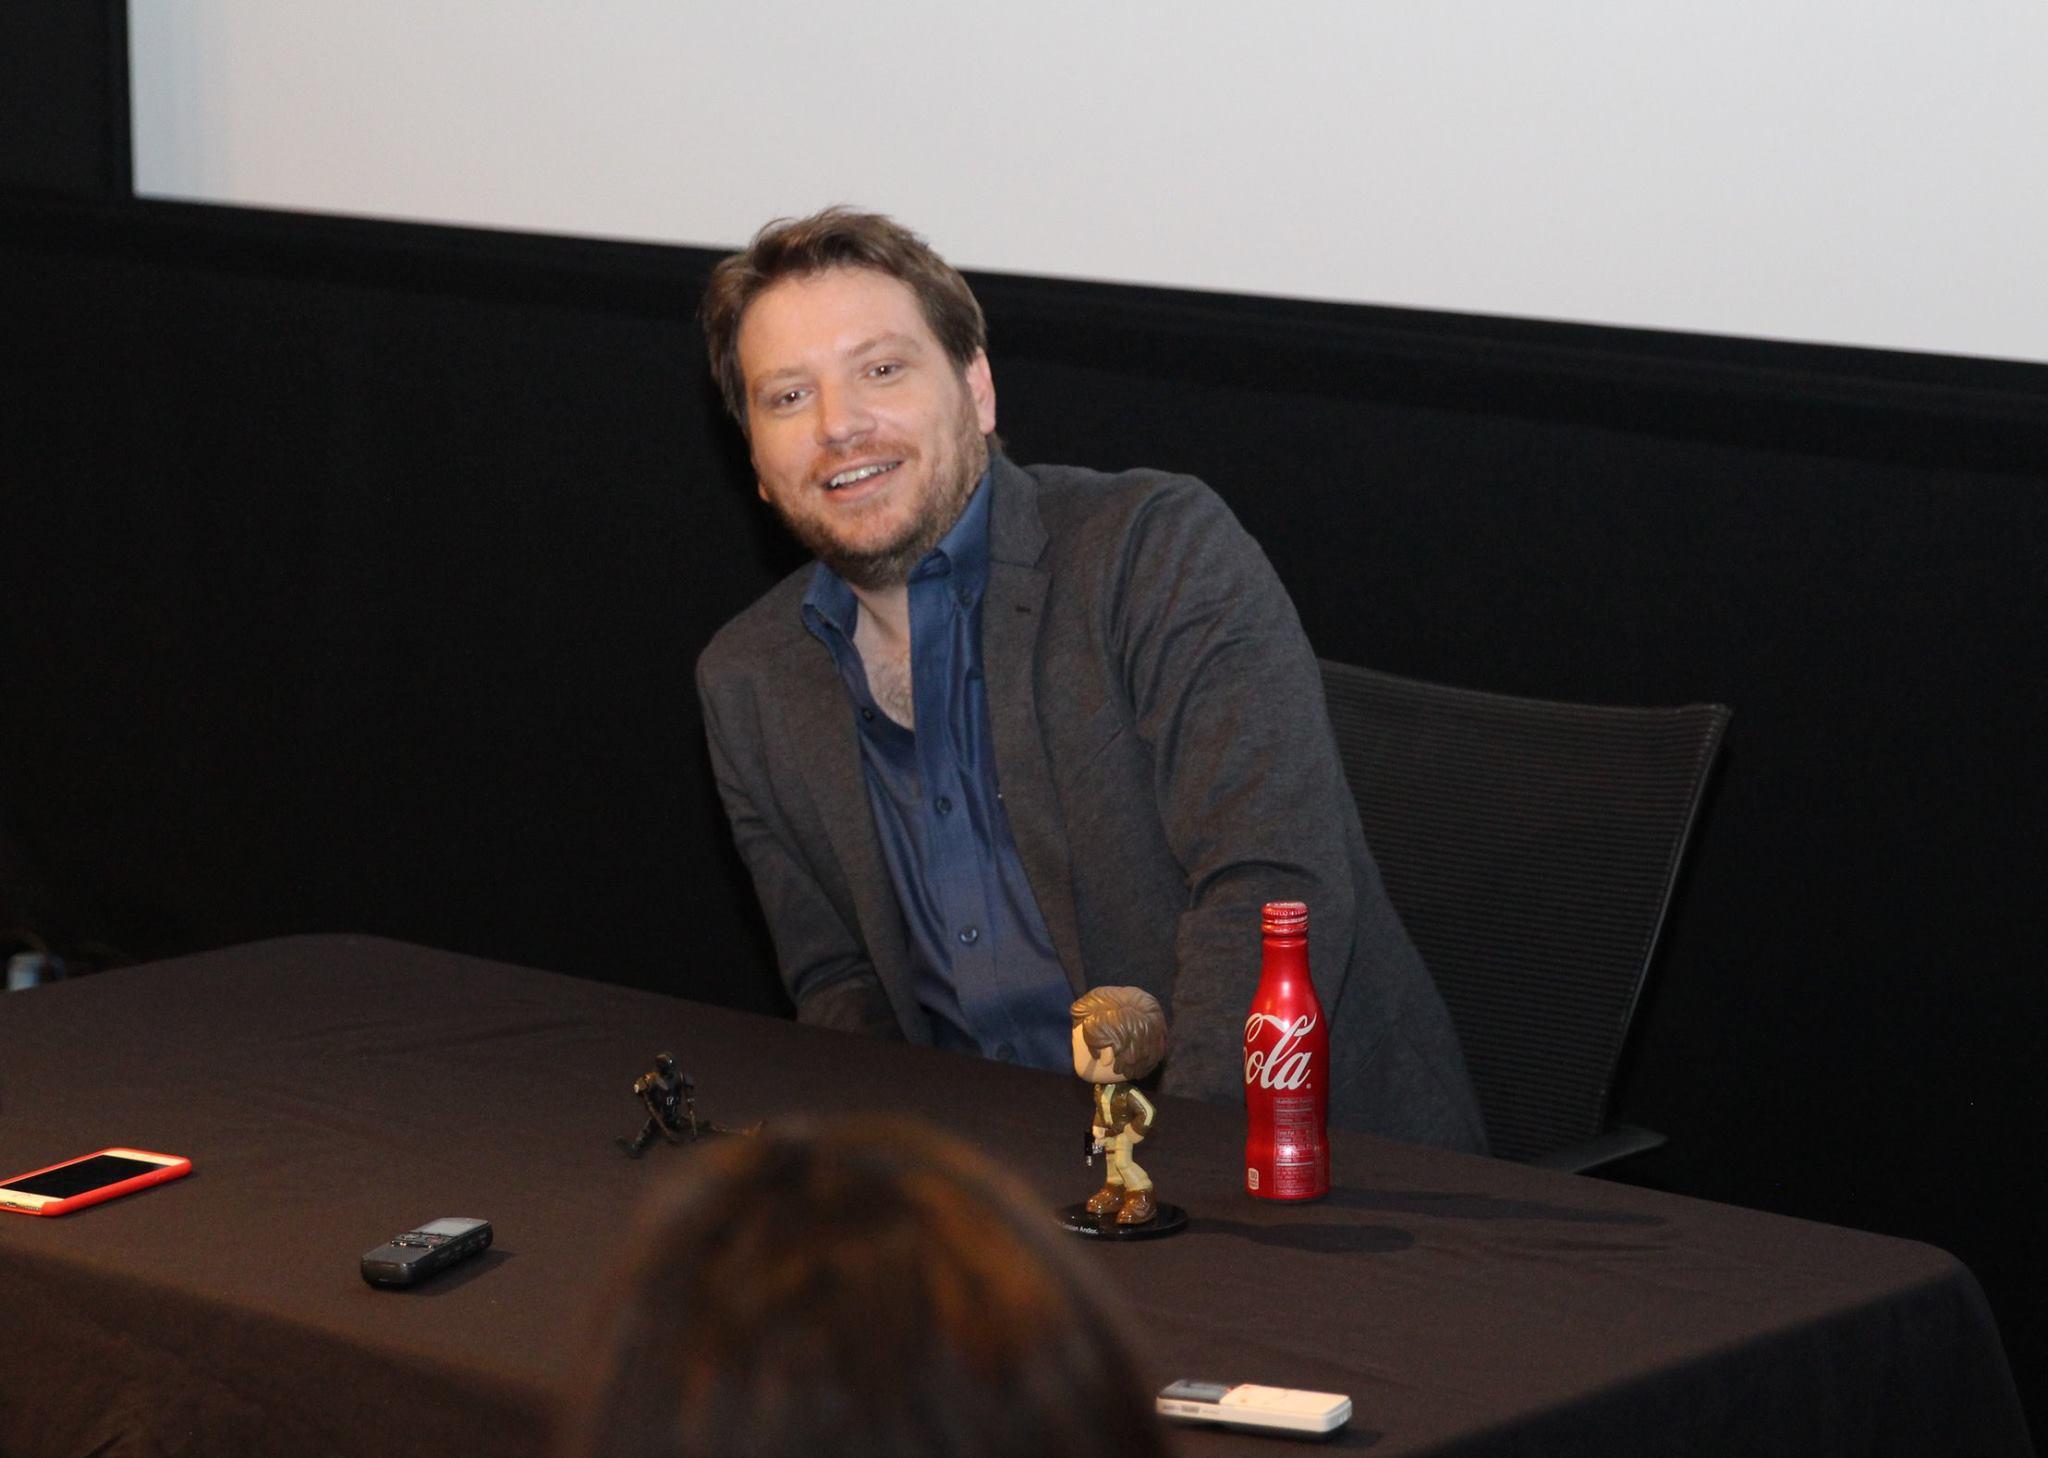 Rogue One: A Star Wars Story Director Gareth Edwards